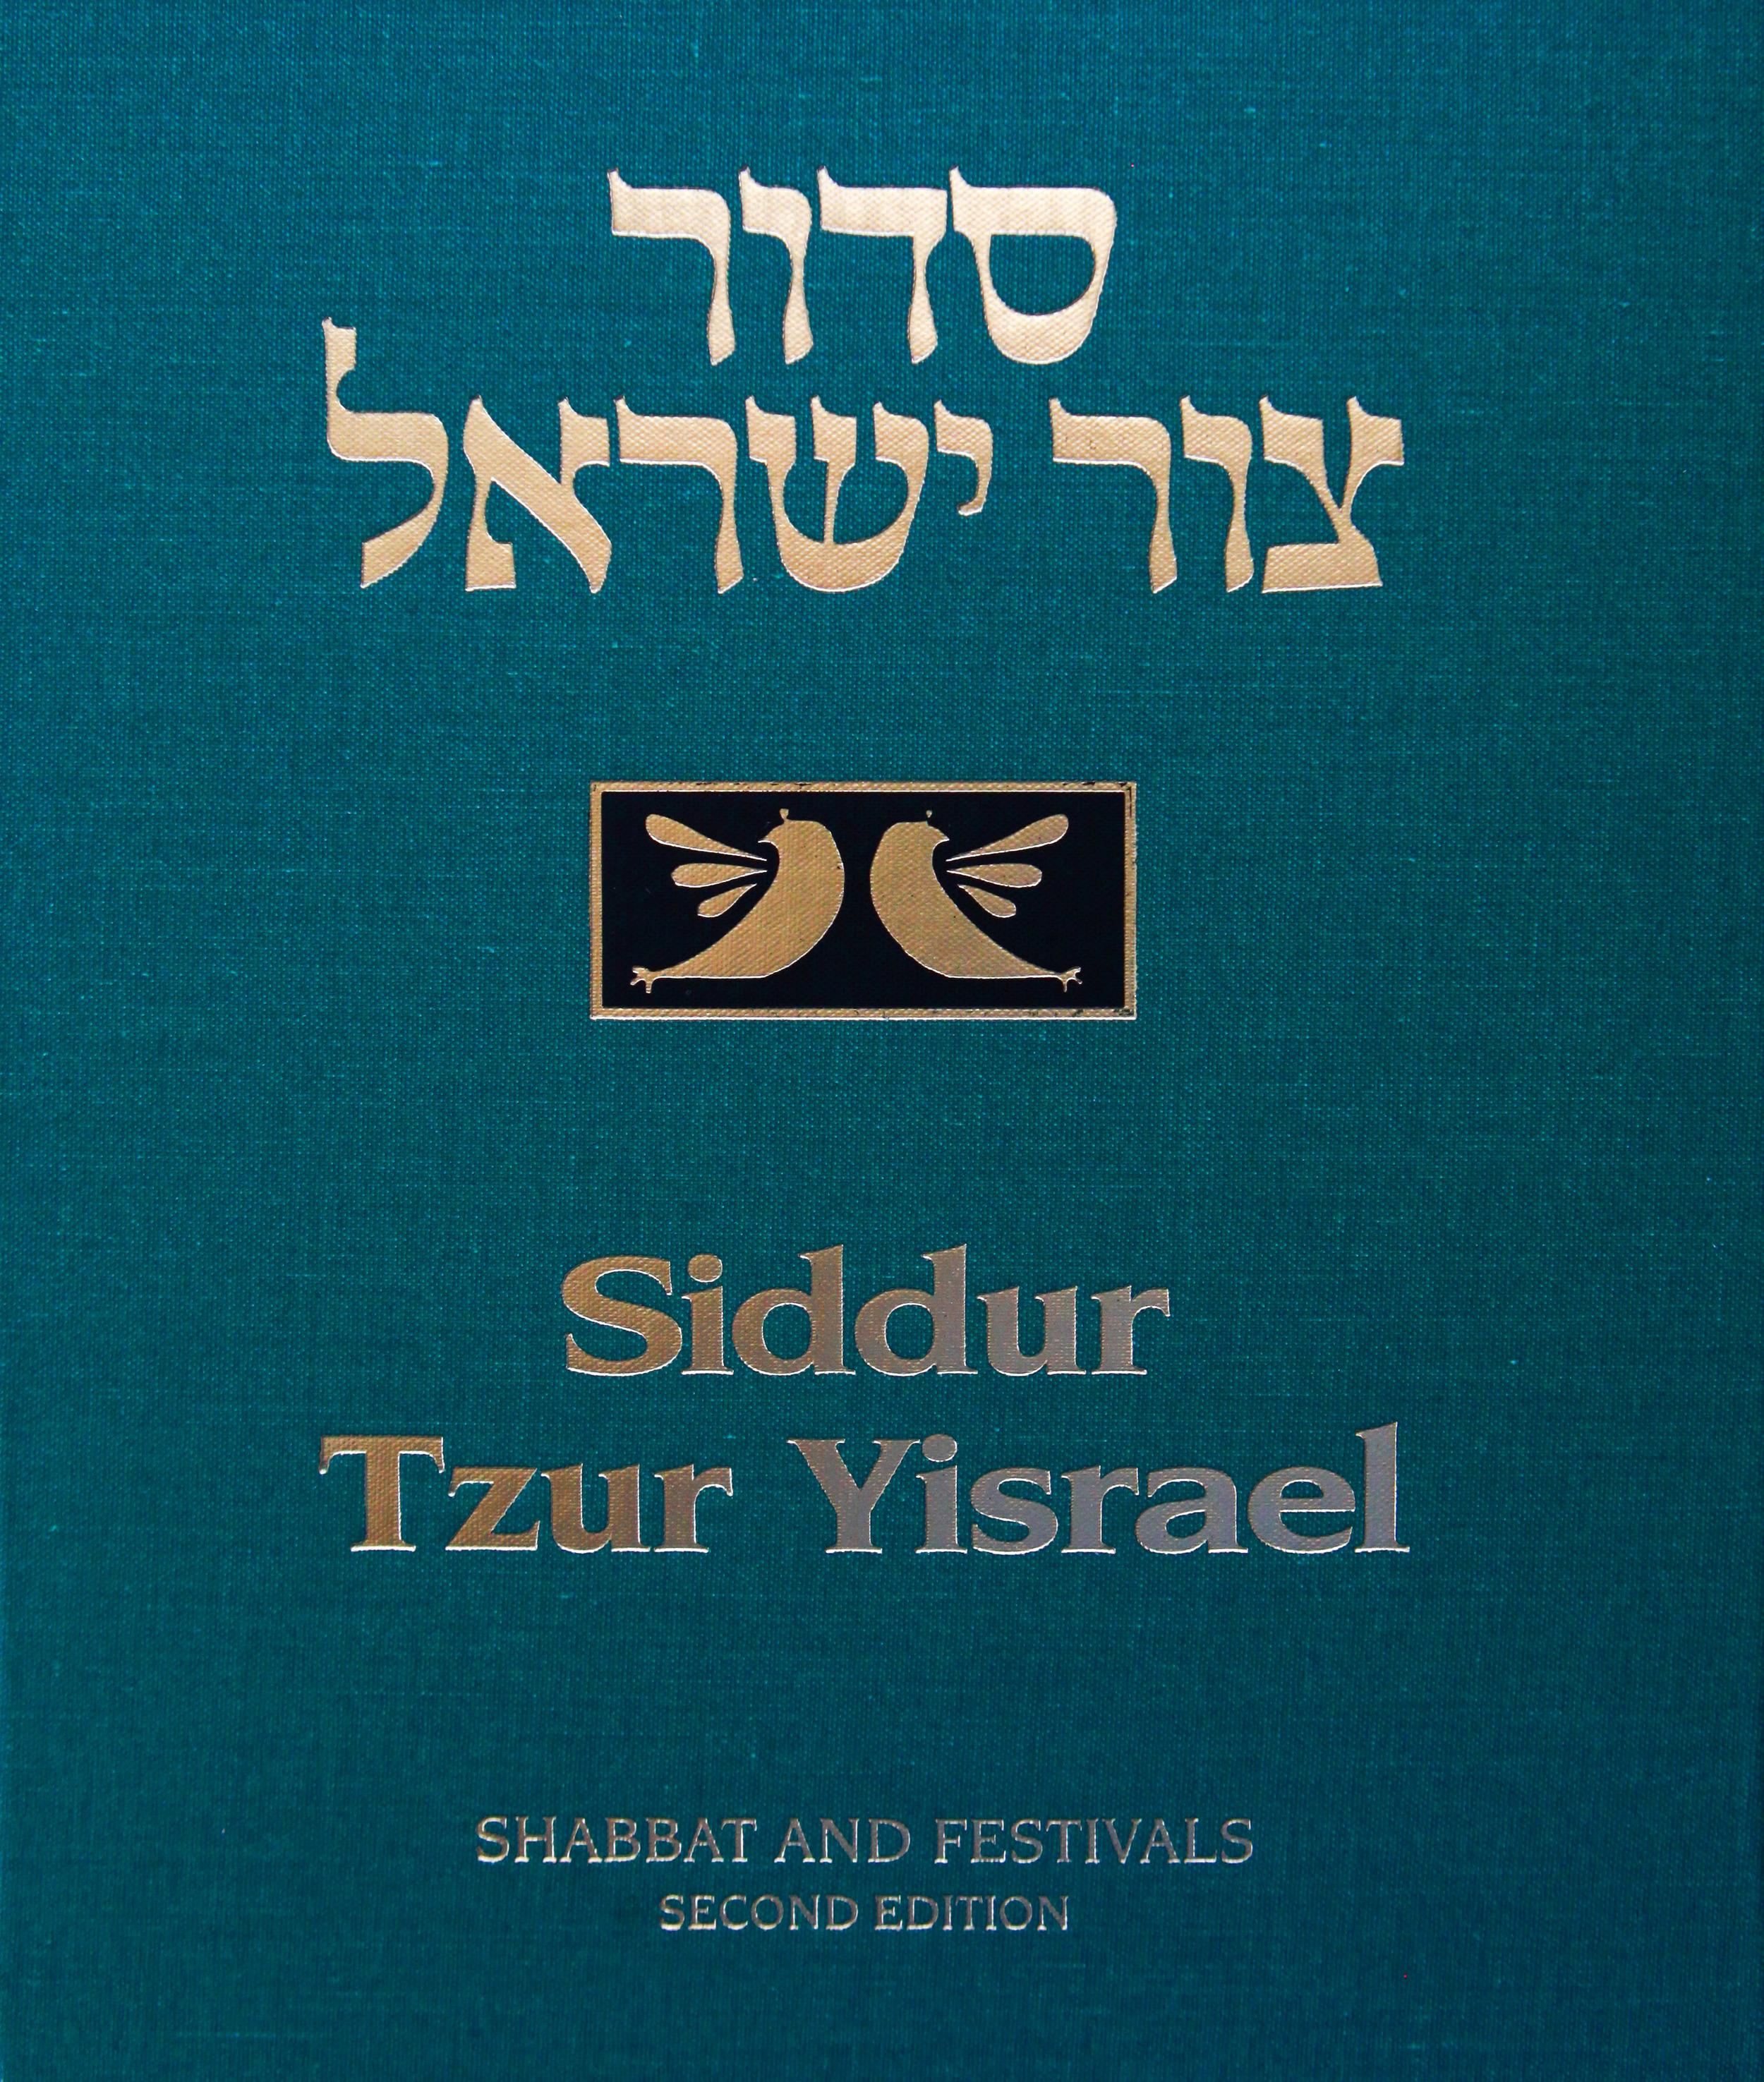 Tzur Yisrael - Shabbat and Festivals Cover.JPG